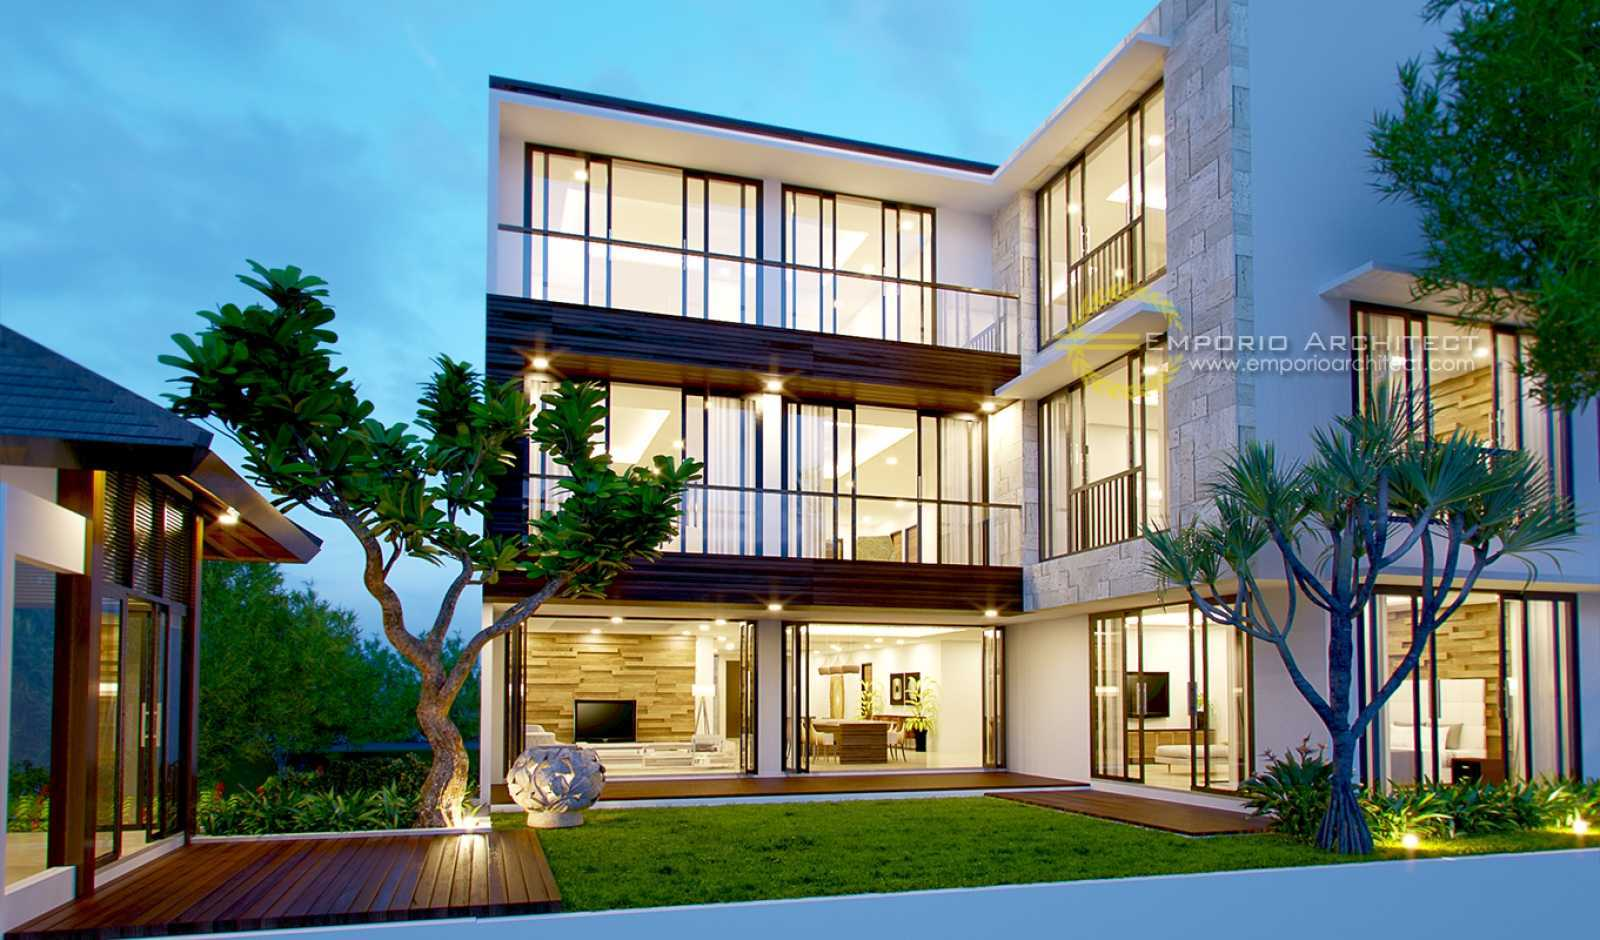 Emporio Architect Jasa Arsitek Cikarang Desain Rumah Modern Tropis 246 @ Cikarang, Bekasi Cikarang, Bekasi, Jawa Barat, Indonesia Cikarang, Bekasi, Jawa Barat, Indonesia Emporio-Architect-Jasa-Arsitek-Cikarang-Desain-Rumah-Modern-Tropis-246-Cikarang-Bekasi   80726